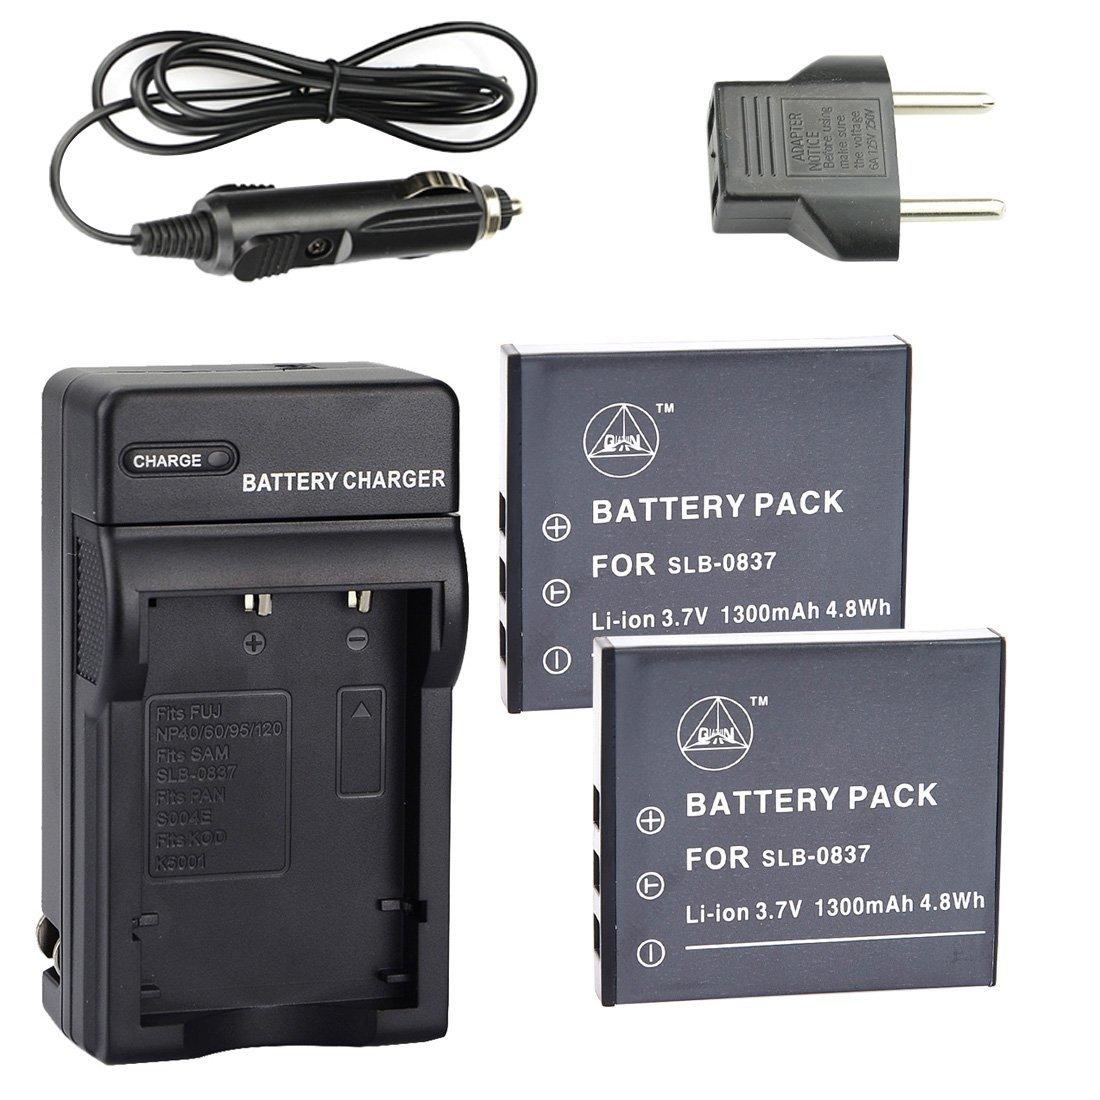 NV11 NV18 L70 NV3 NV12 NV8 L370 L730 L830 L74 L73 NV10 NV5 P83 Digital Camera NV7 OPS i7 ABC Products/® Samsung SUC-C2 SUCC2 USB Cable Lead Cord // Battery Charger for Digimax i5 i50 L80 i85 L83T L83 i6 i70 NV20 L735 NV15 i7b